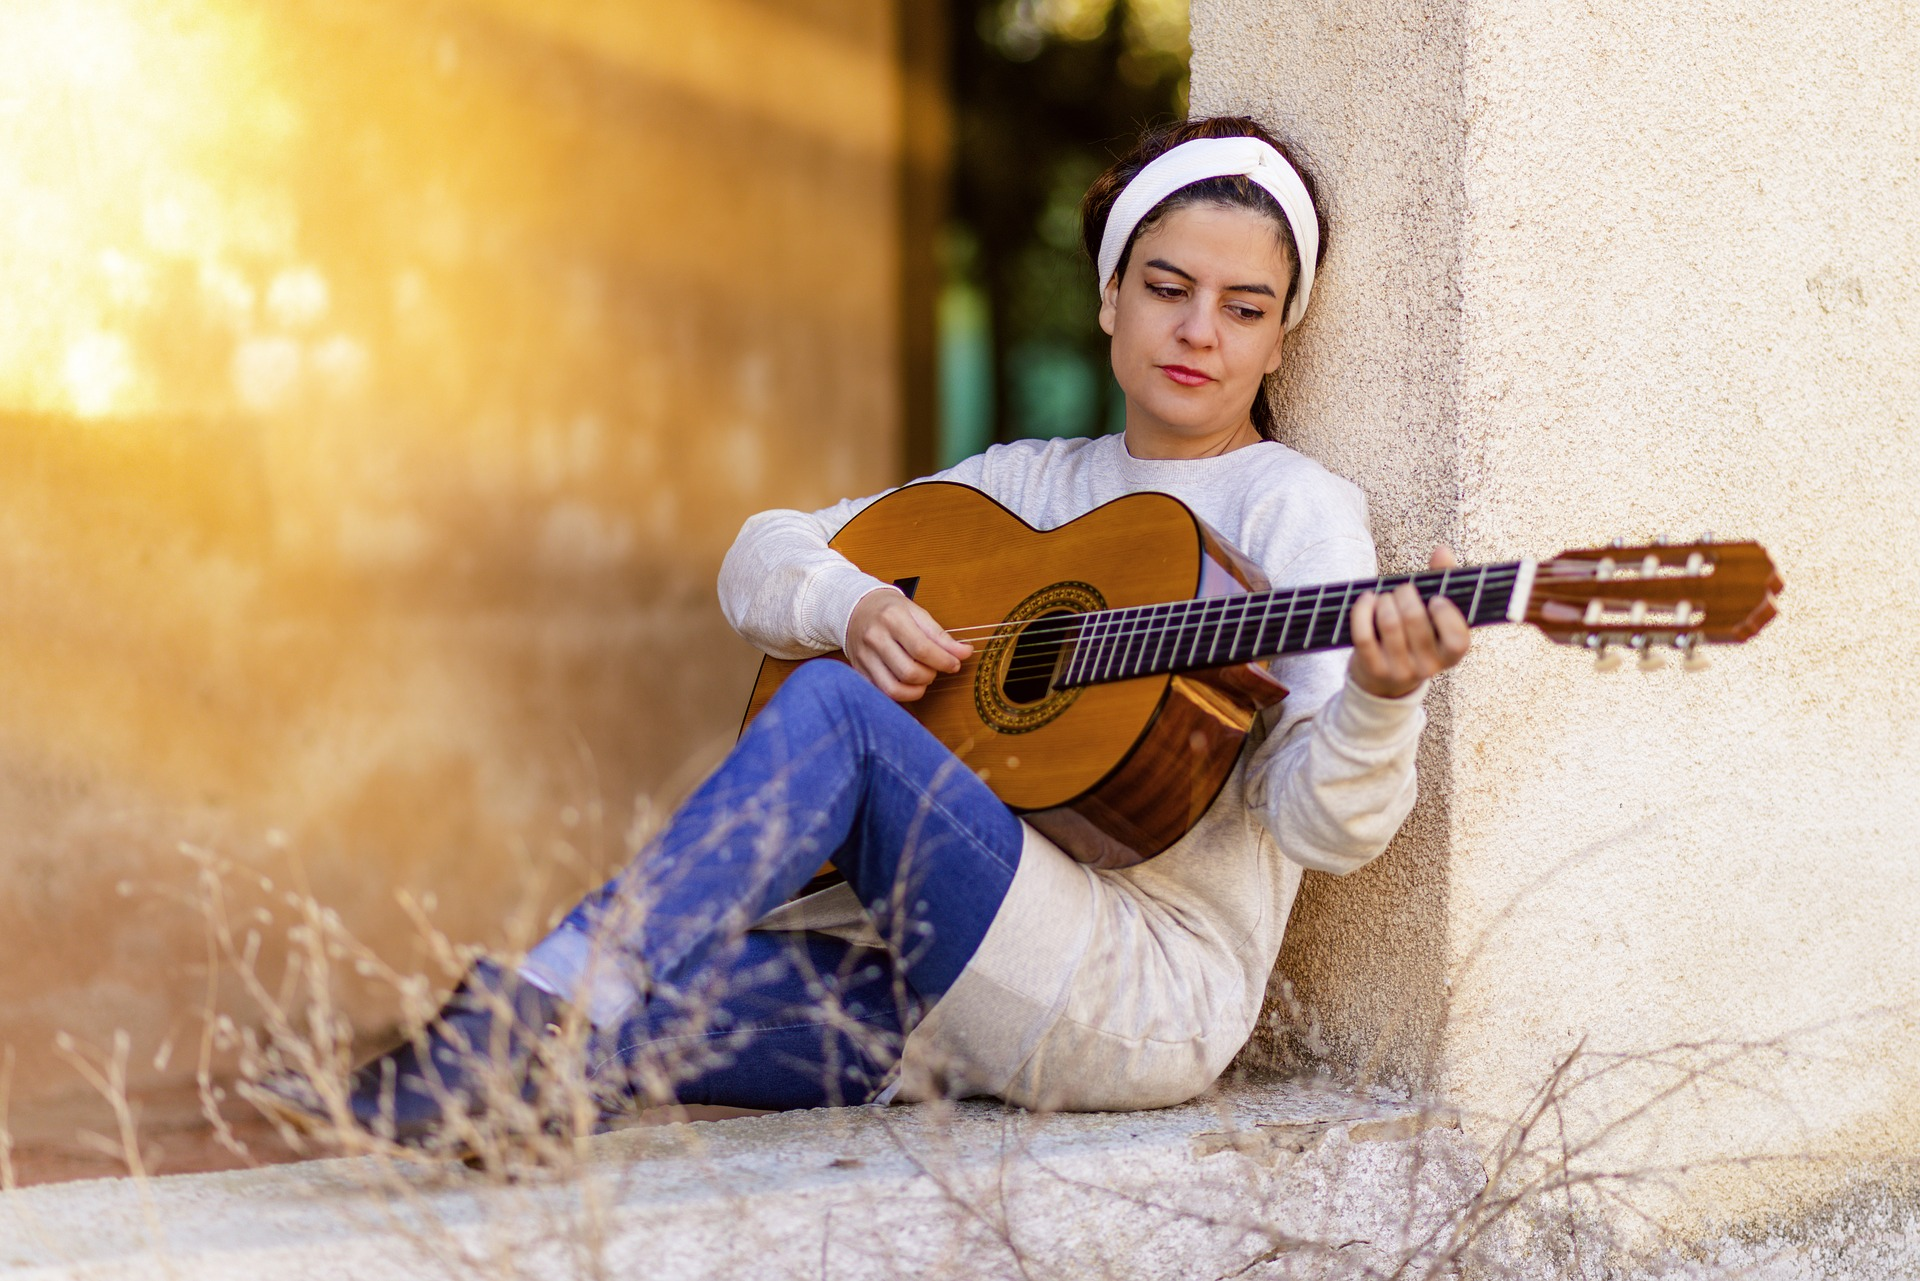 Gitarre lernen als Erwachsener - geht das überhaupt???